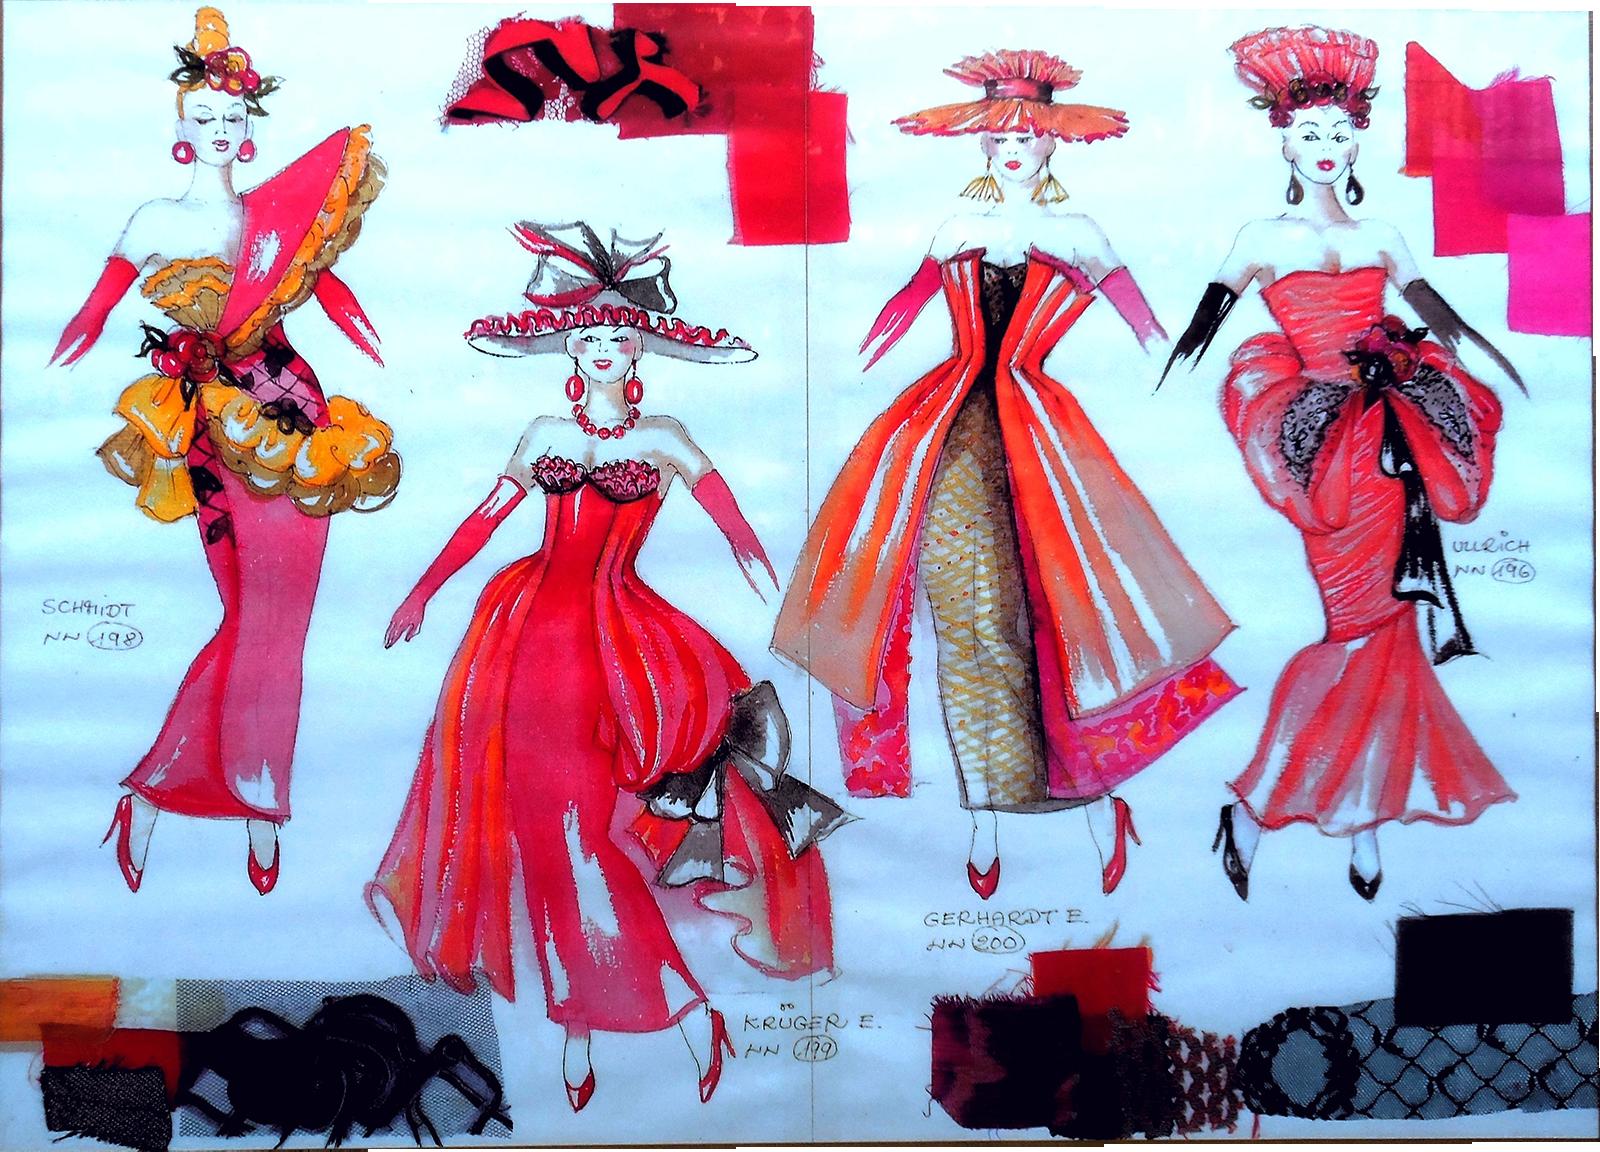 4 Damen Balett Ninotschka 4000x2500 - Kunstgalerie